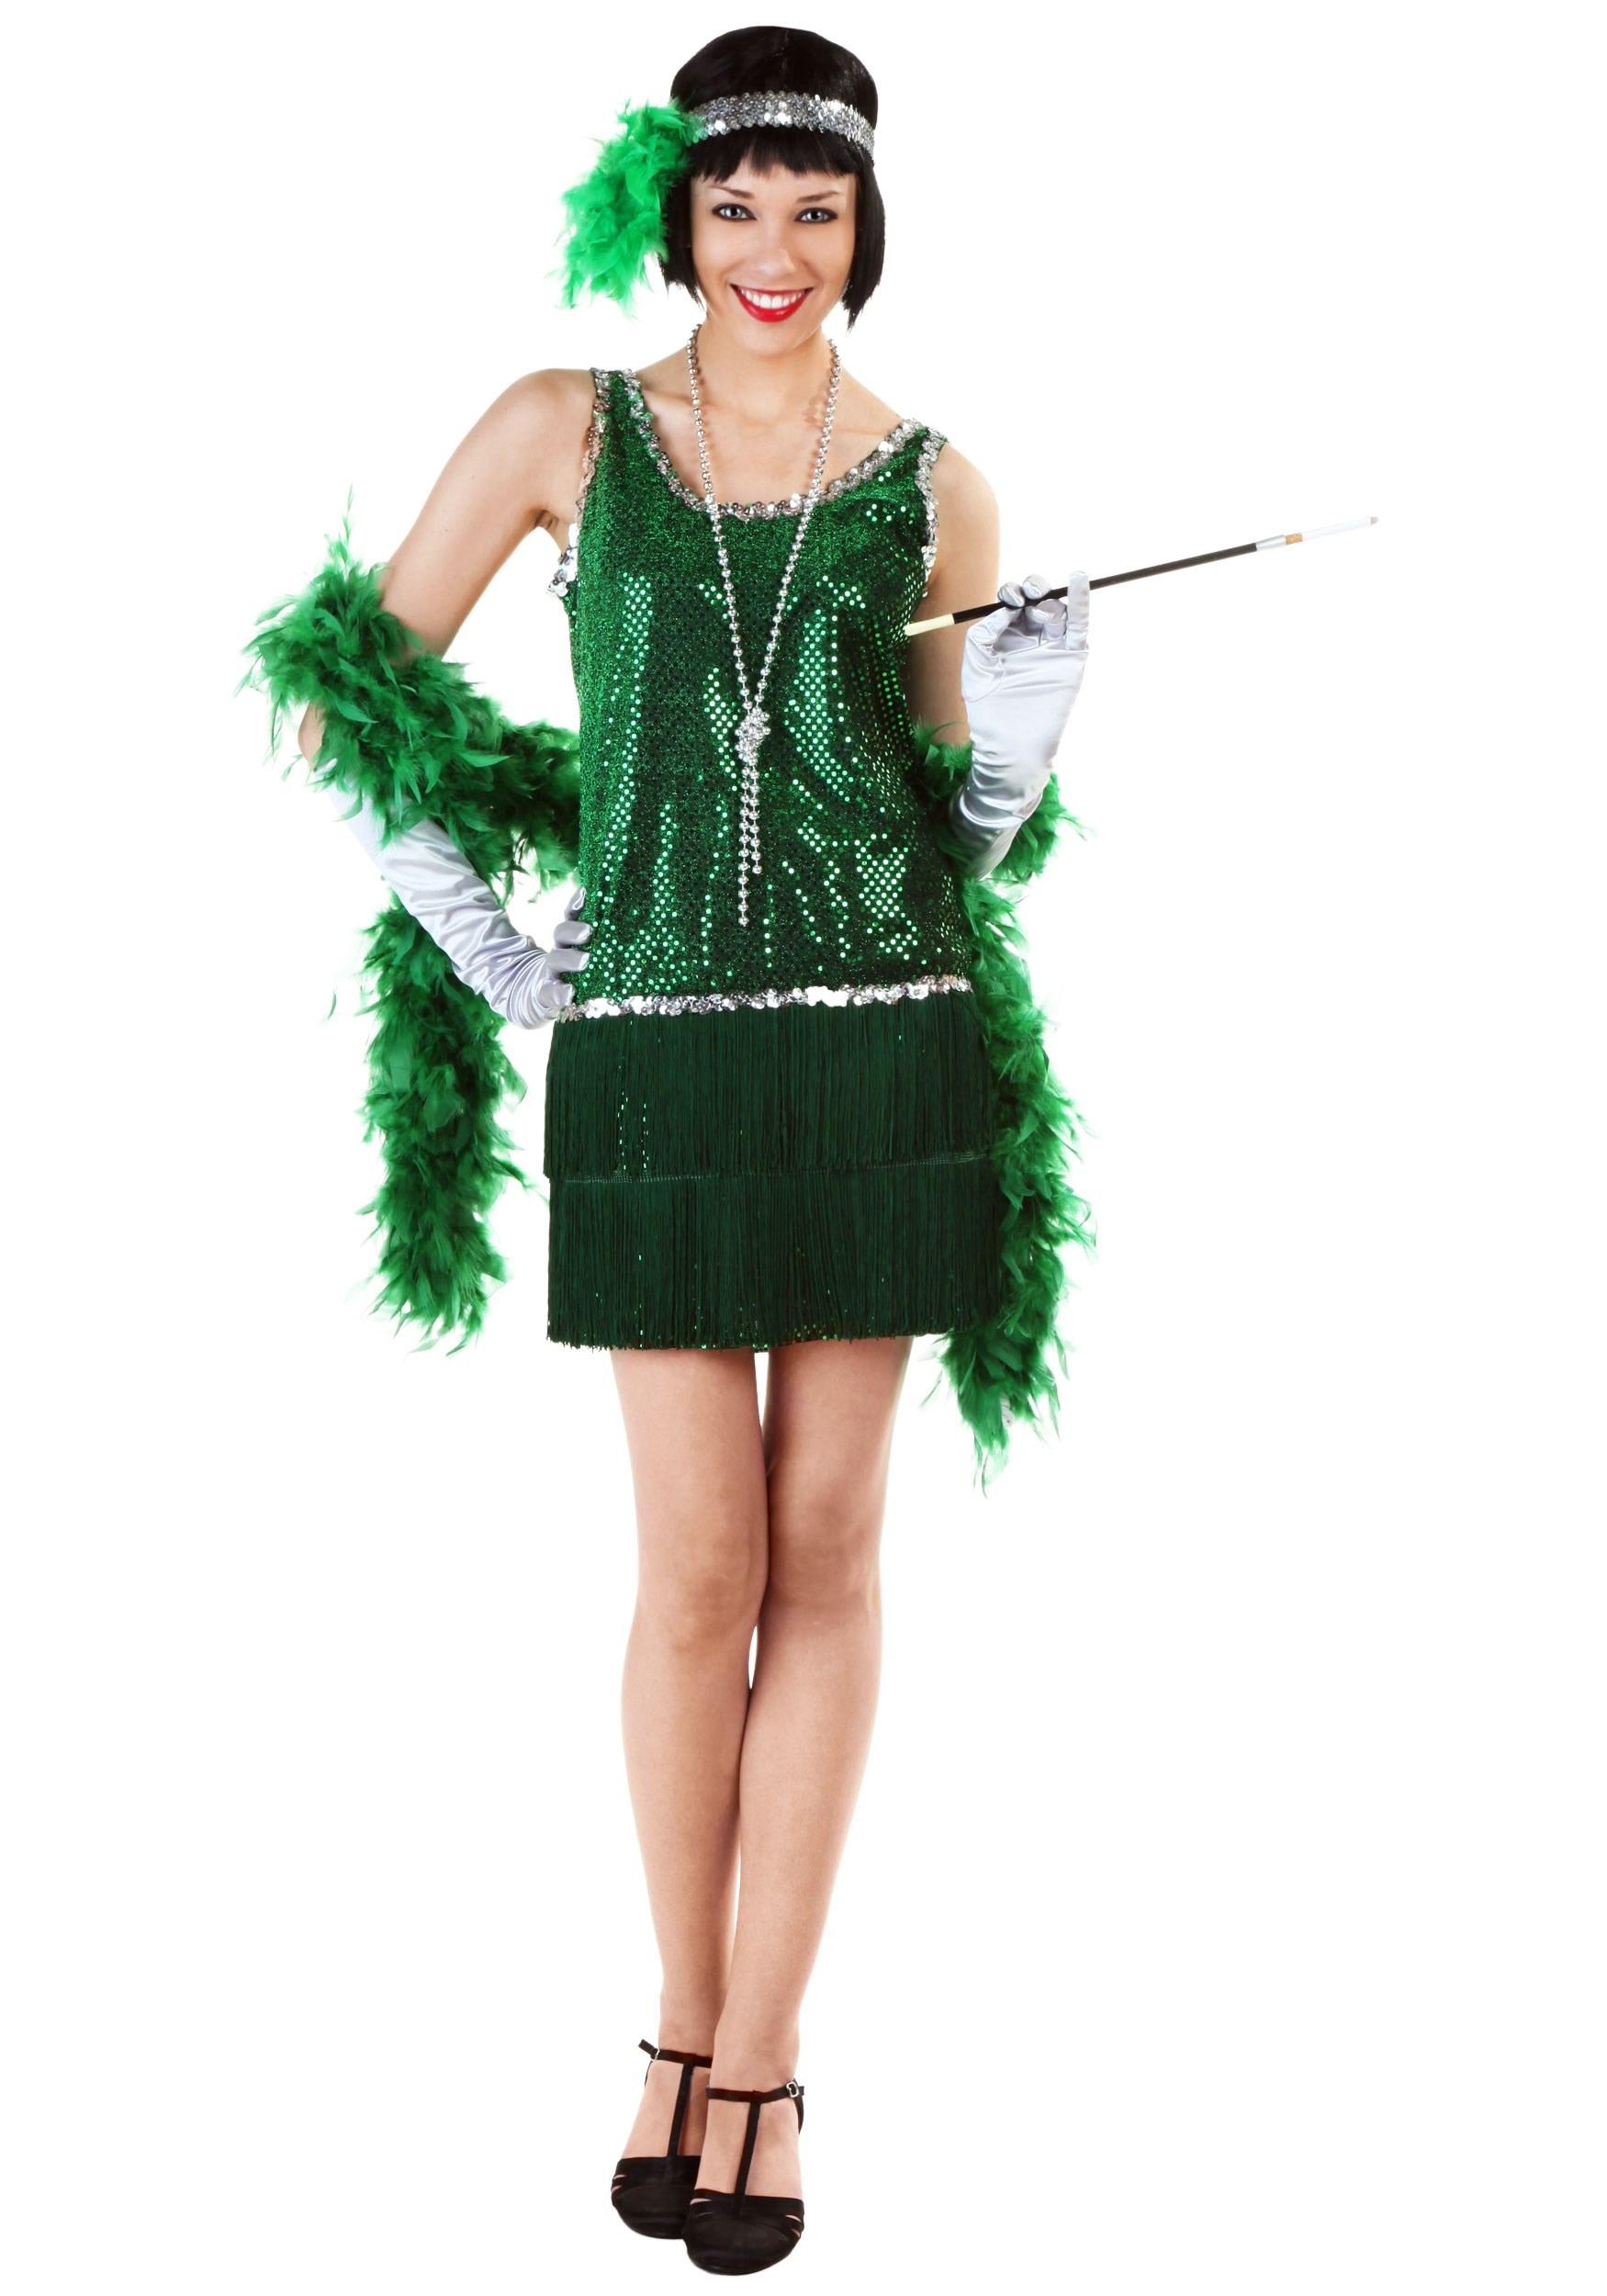 Adult Sequin & Fringe Green Flapper Costume FUN1000GR